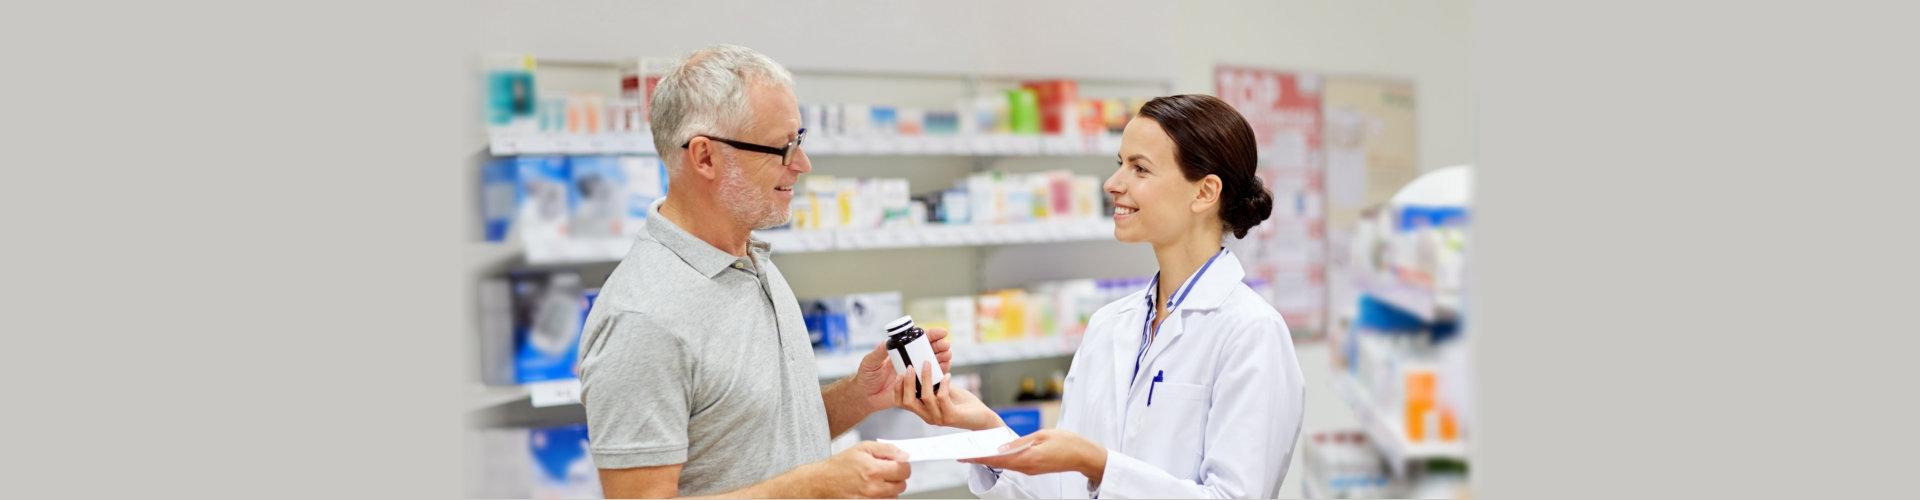 male patient buying medicine